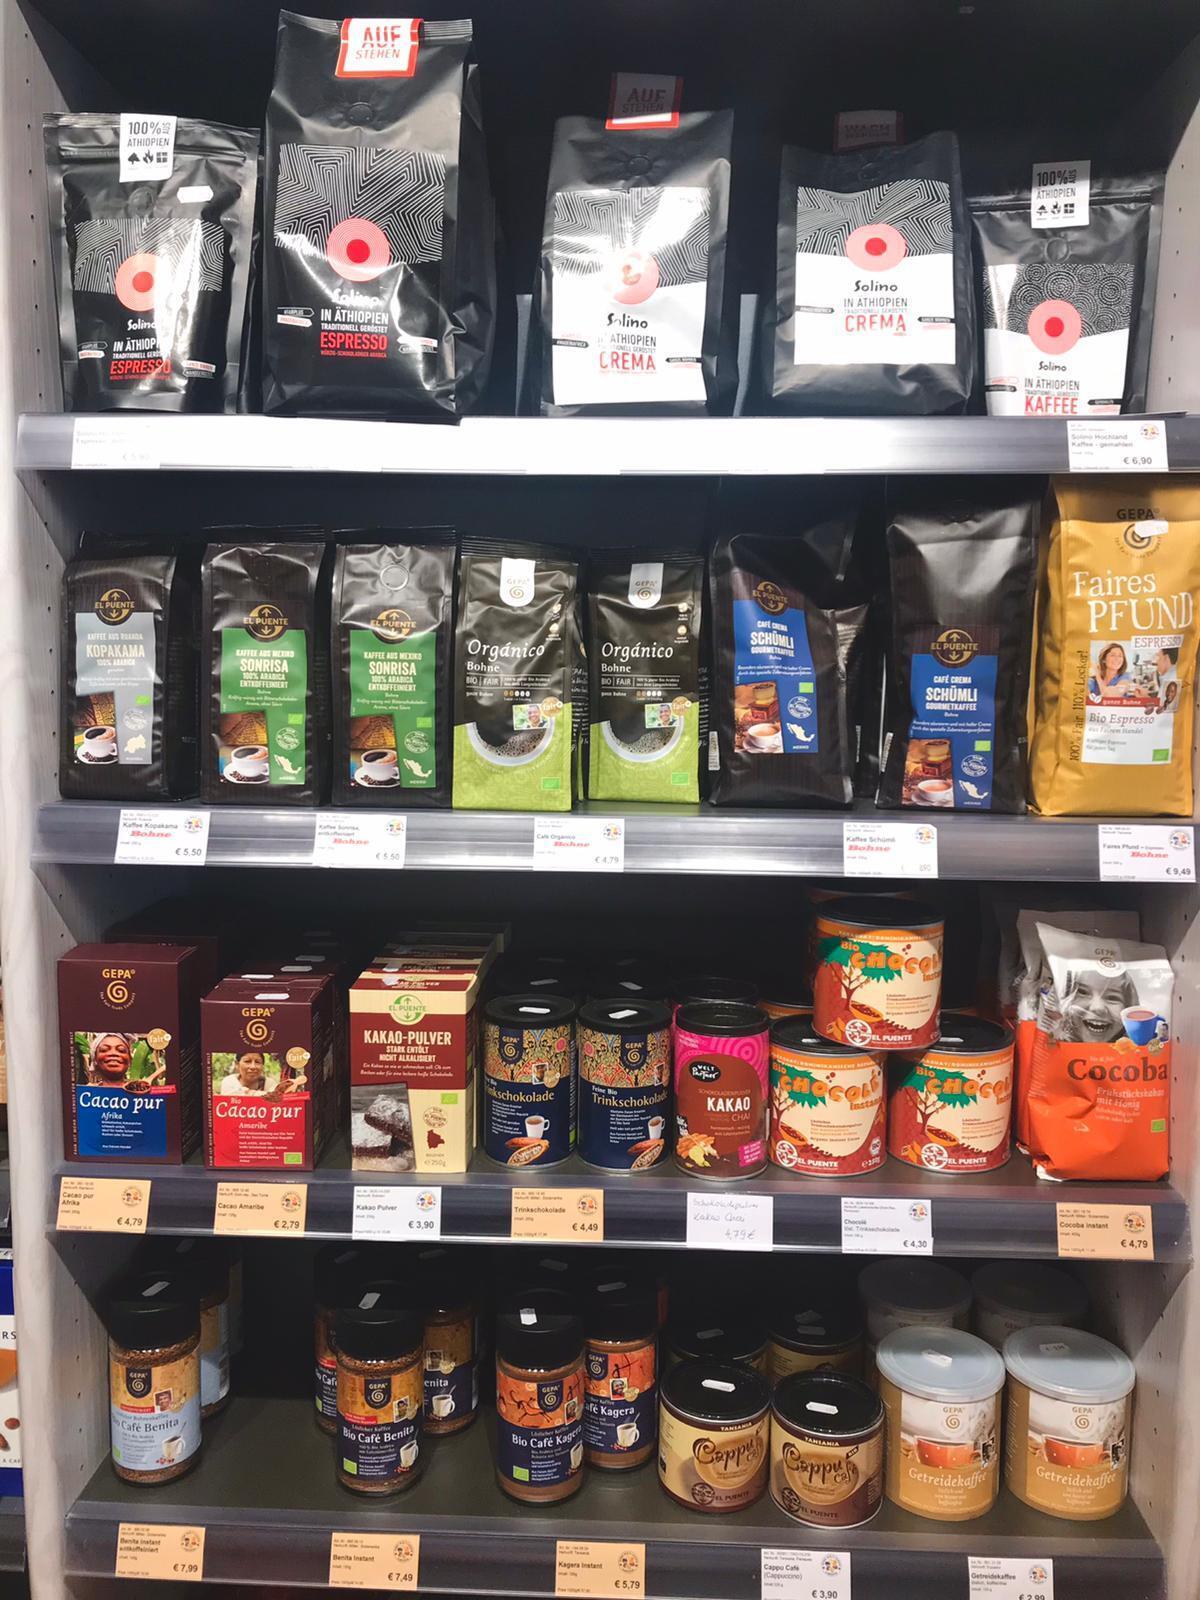 Kaffee und Kakao